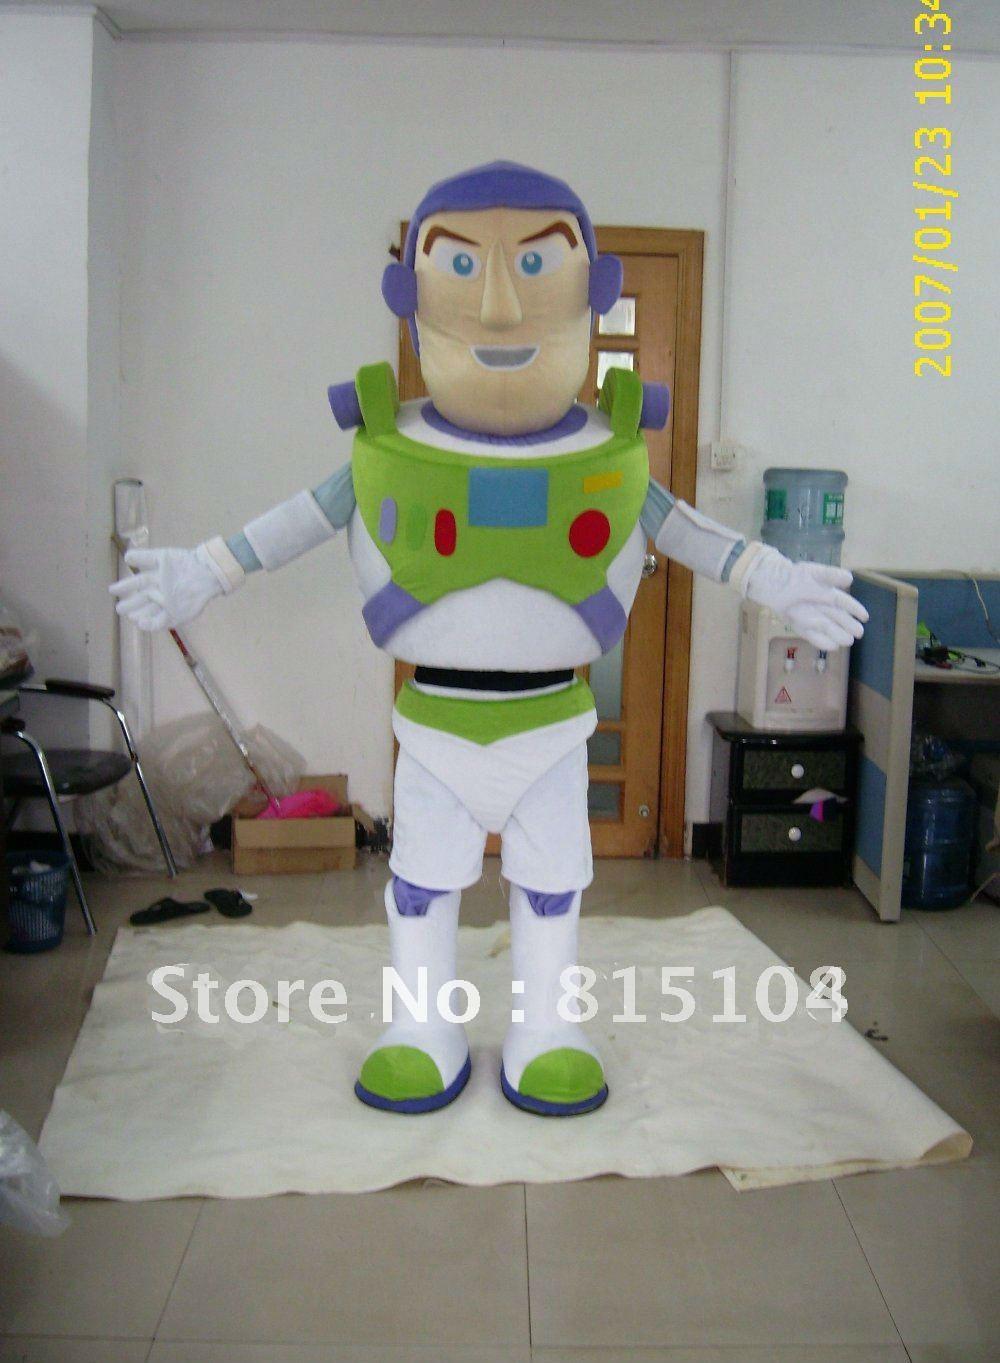 Adult Size Buzz Lightyear Mascot Costumes font b Toy b font font b Story b font 2012, All Sex, Oral, Anal, Lesbian, Toys, Hardcore, XXX, Adult 608 x 336